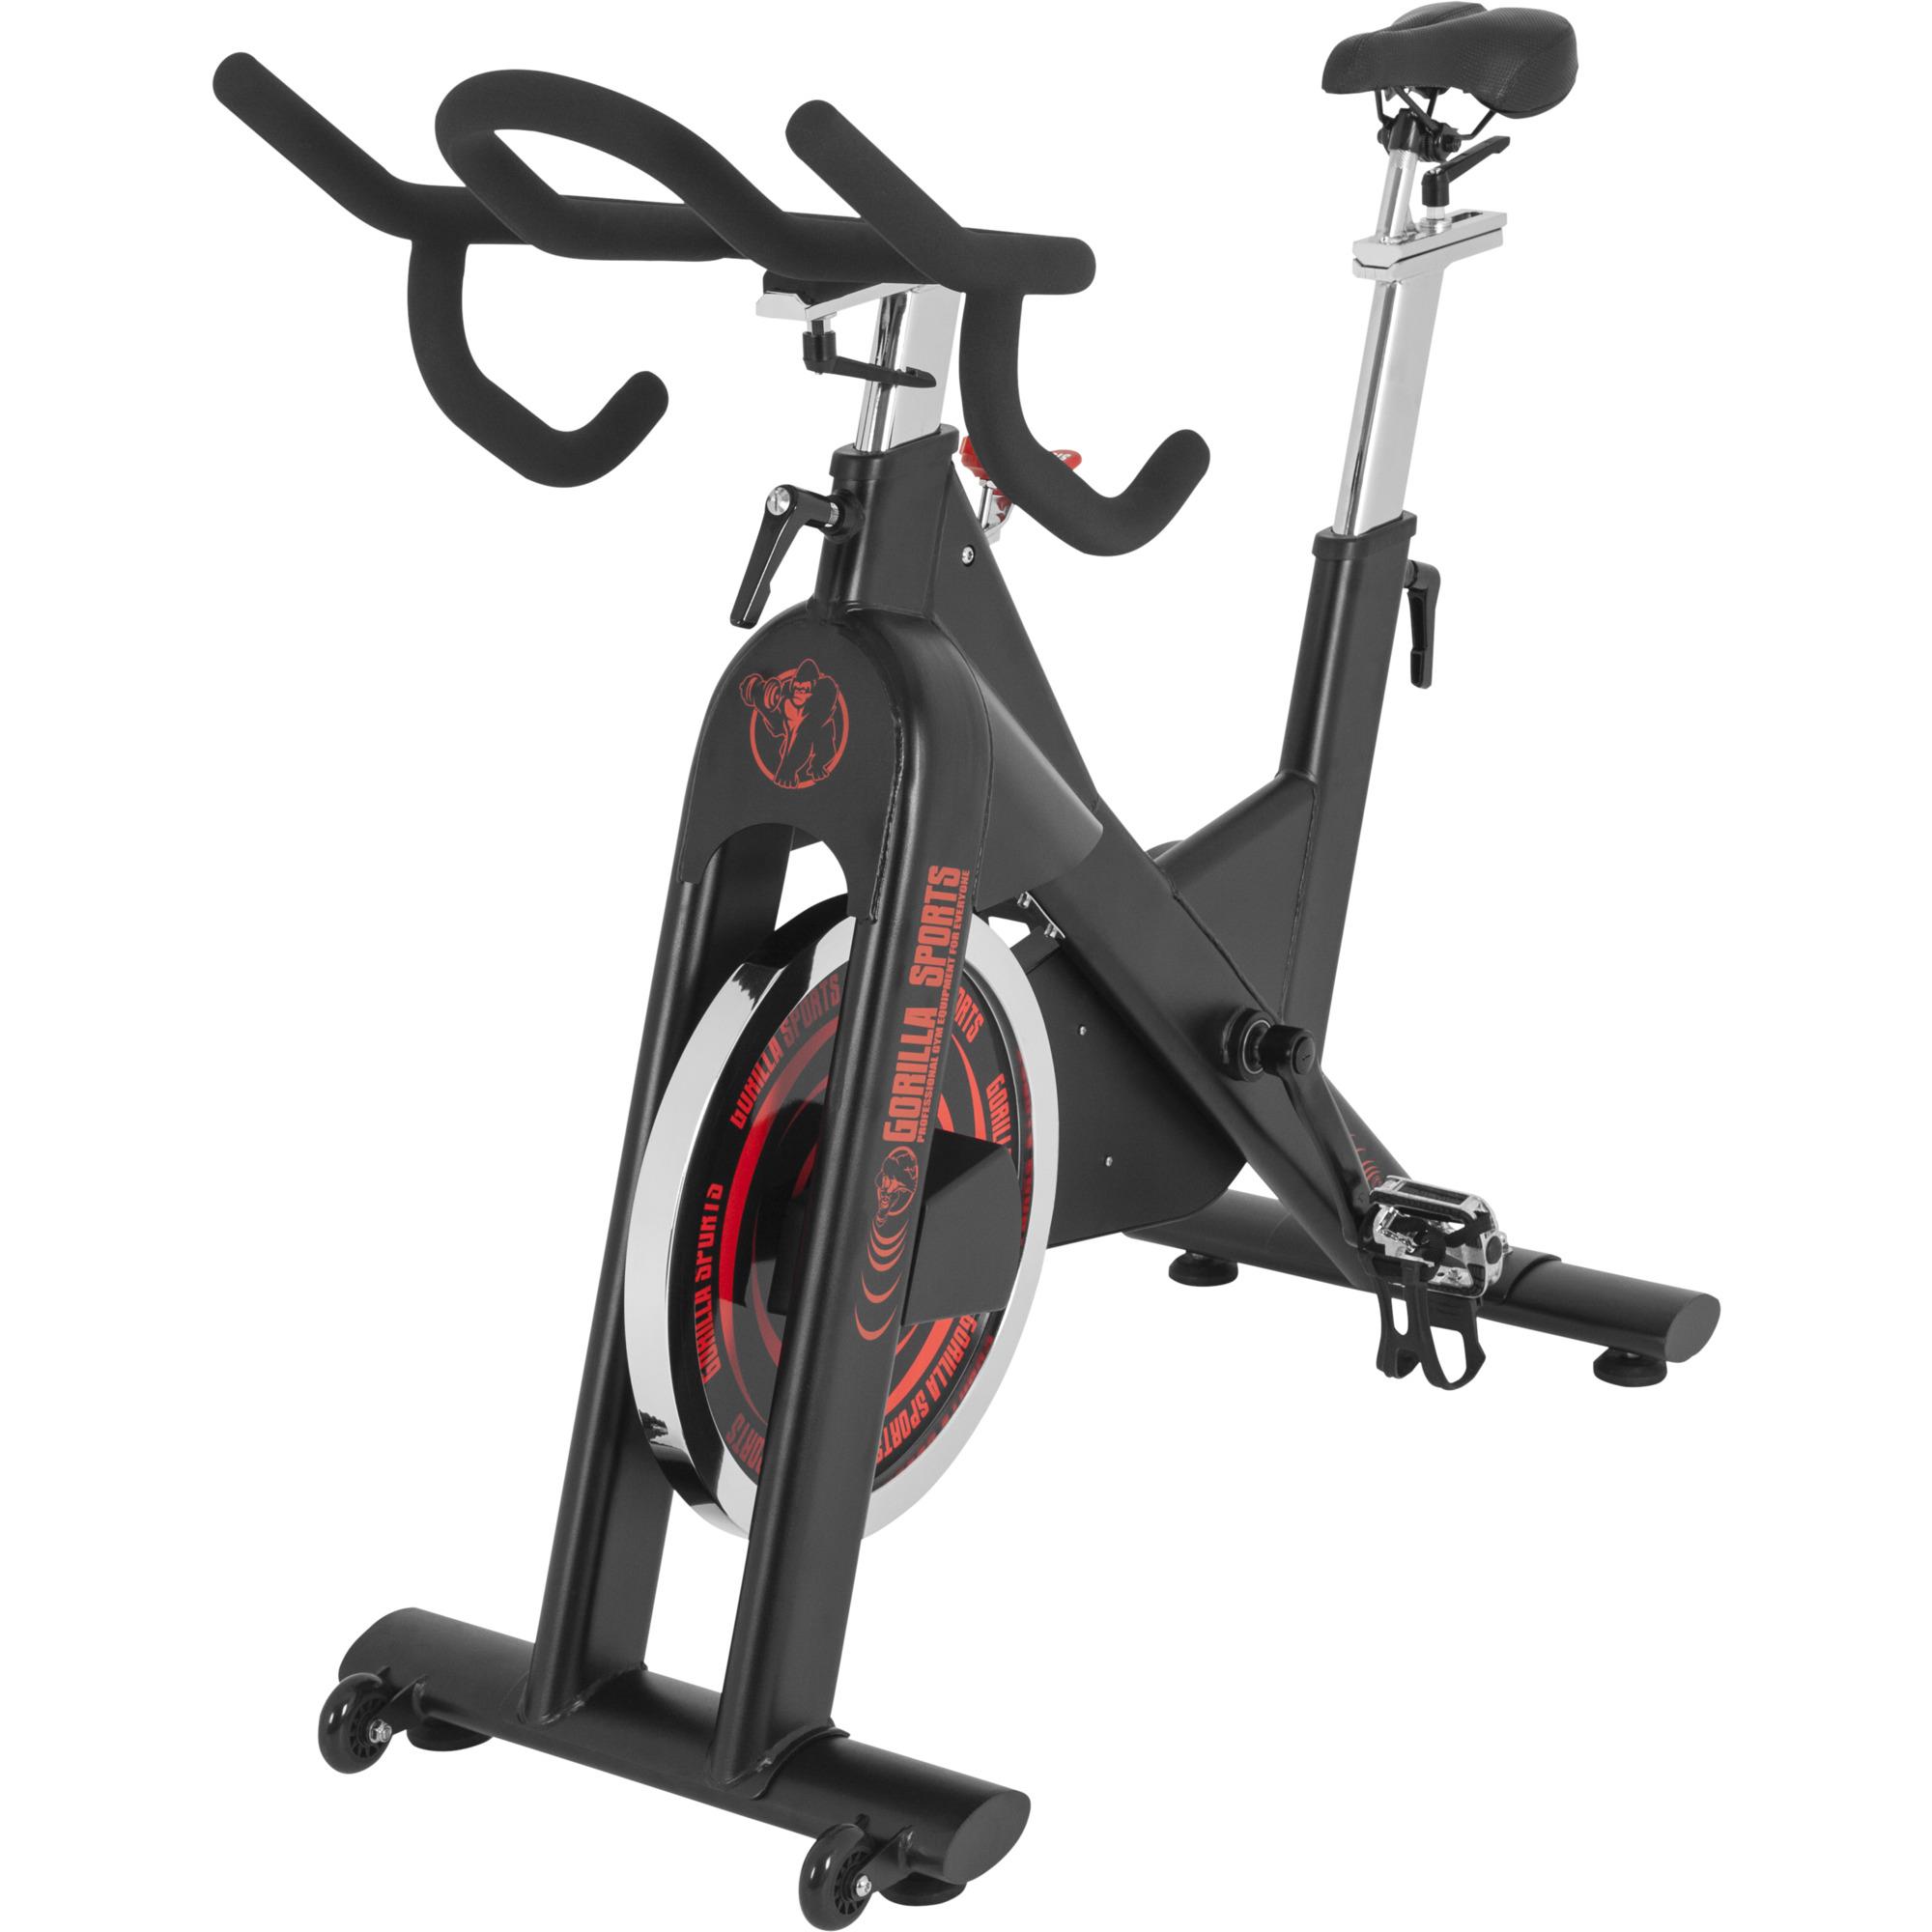 v lo d 39 appartement gorilla sports indoor cycling bike 10000619. Black Bedroom Furniture Sets. Home Design Ideas